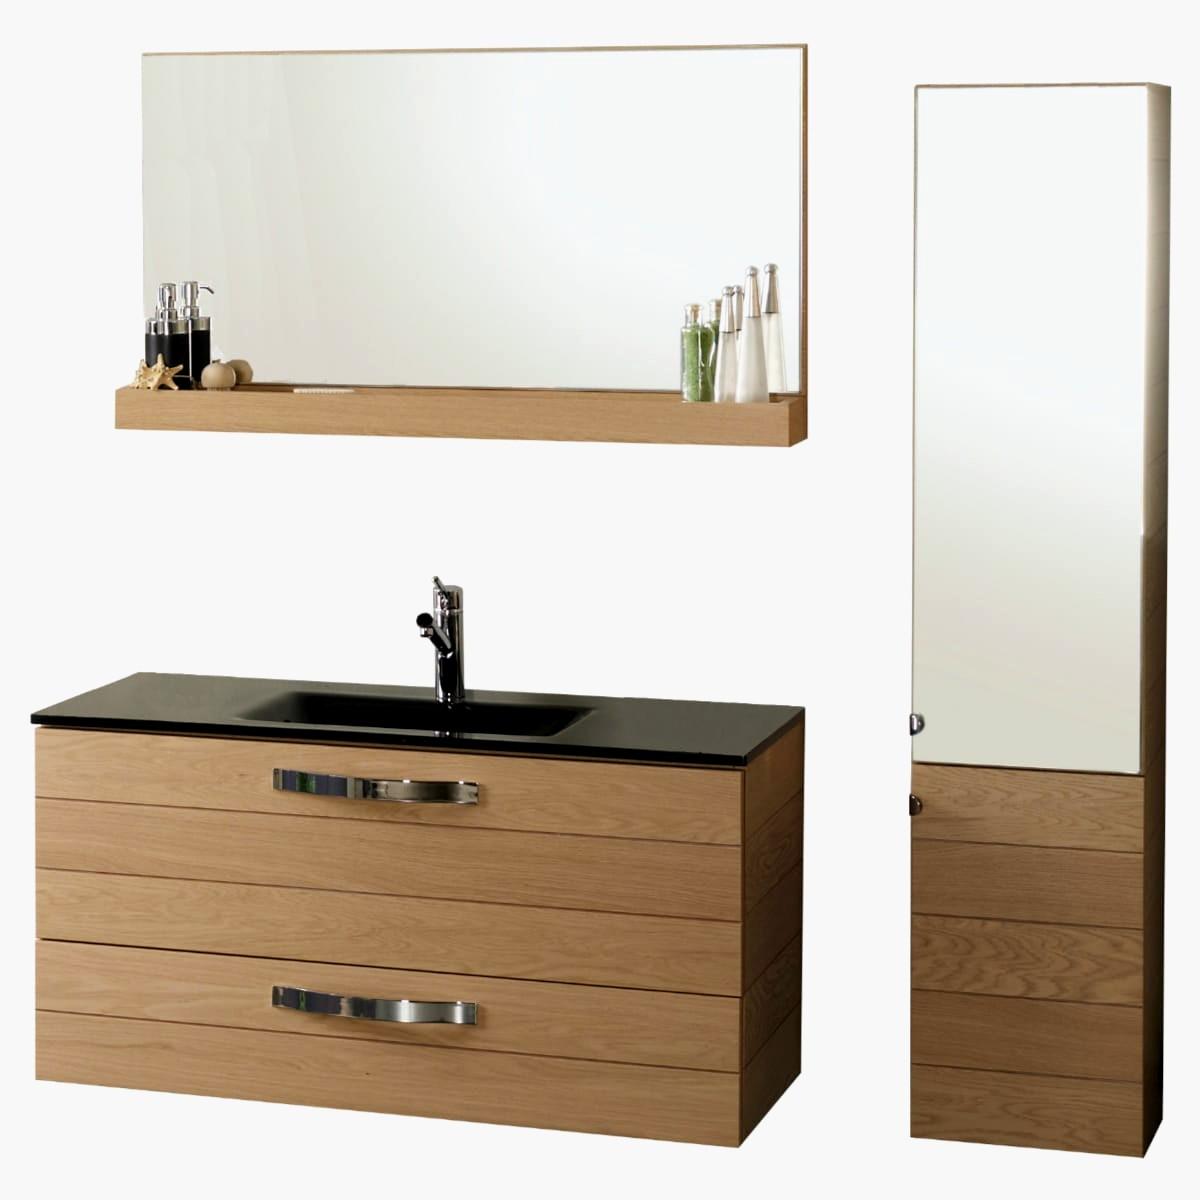 Meuble Wc Brico Dépot Luxe Photos Article with Tag Ikea Salon Deco